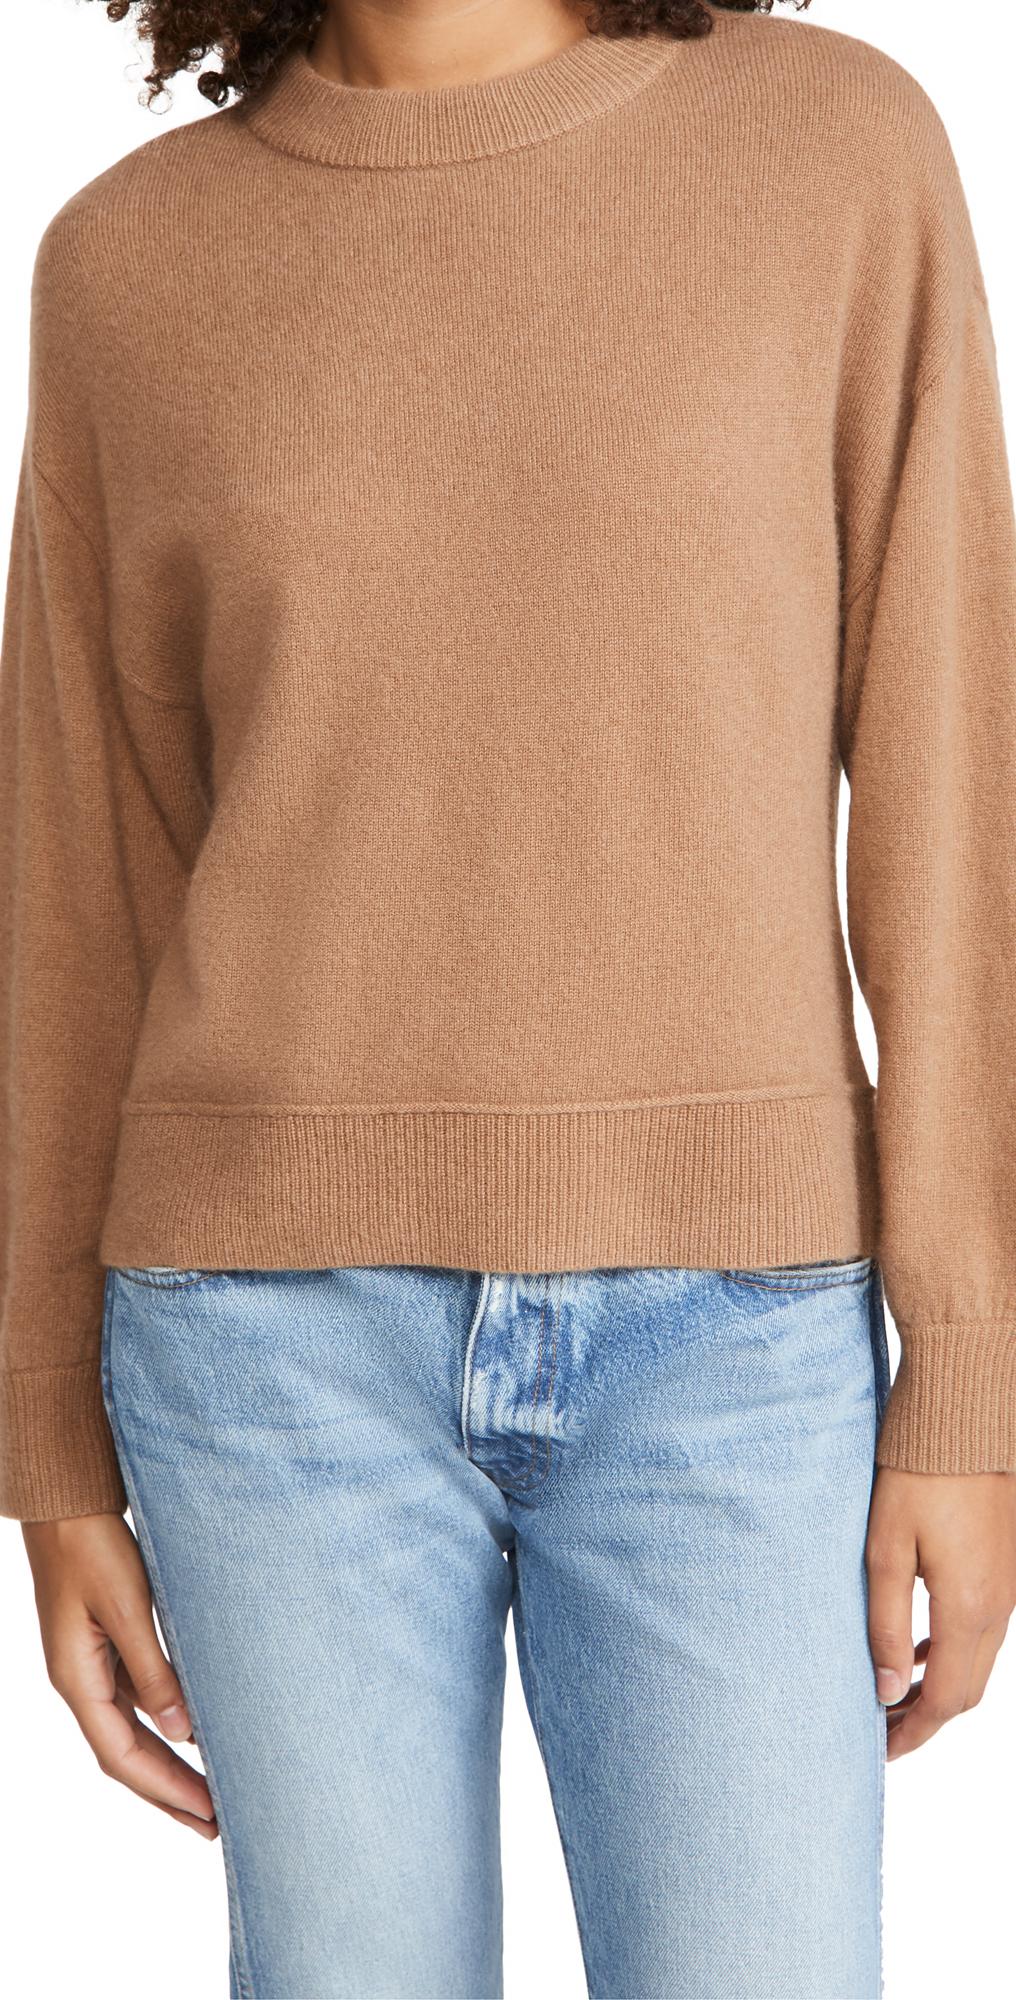 alice + olivia Denver Round Hem Cashmere Sweater